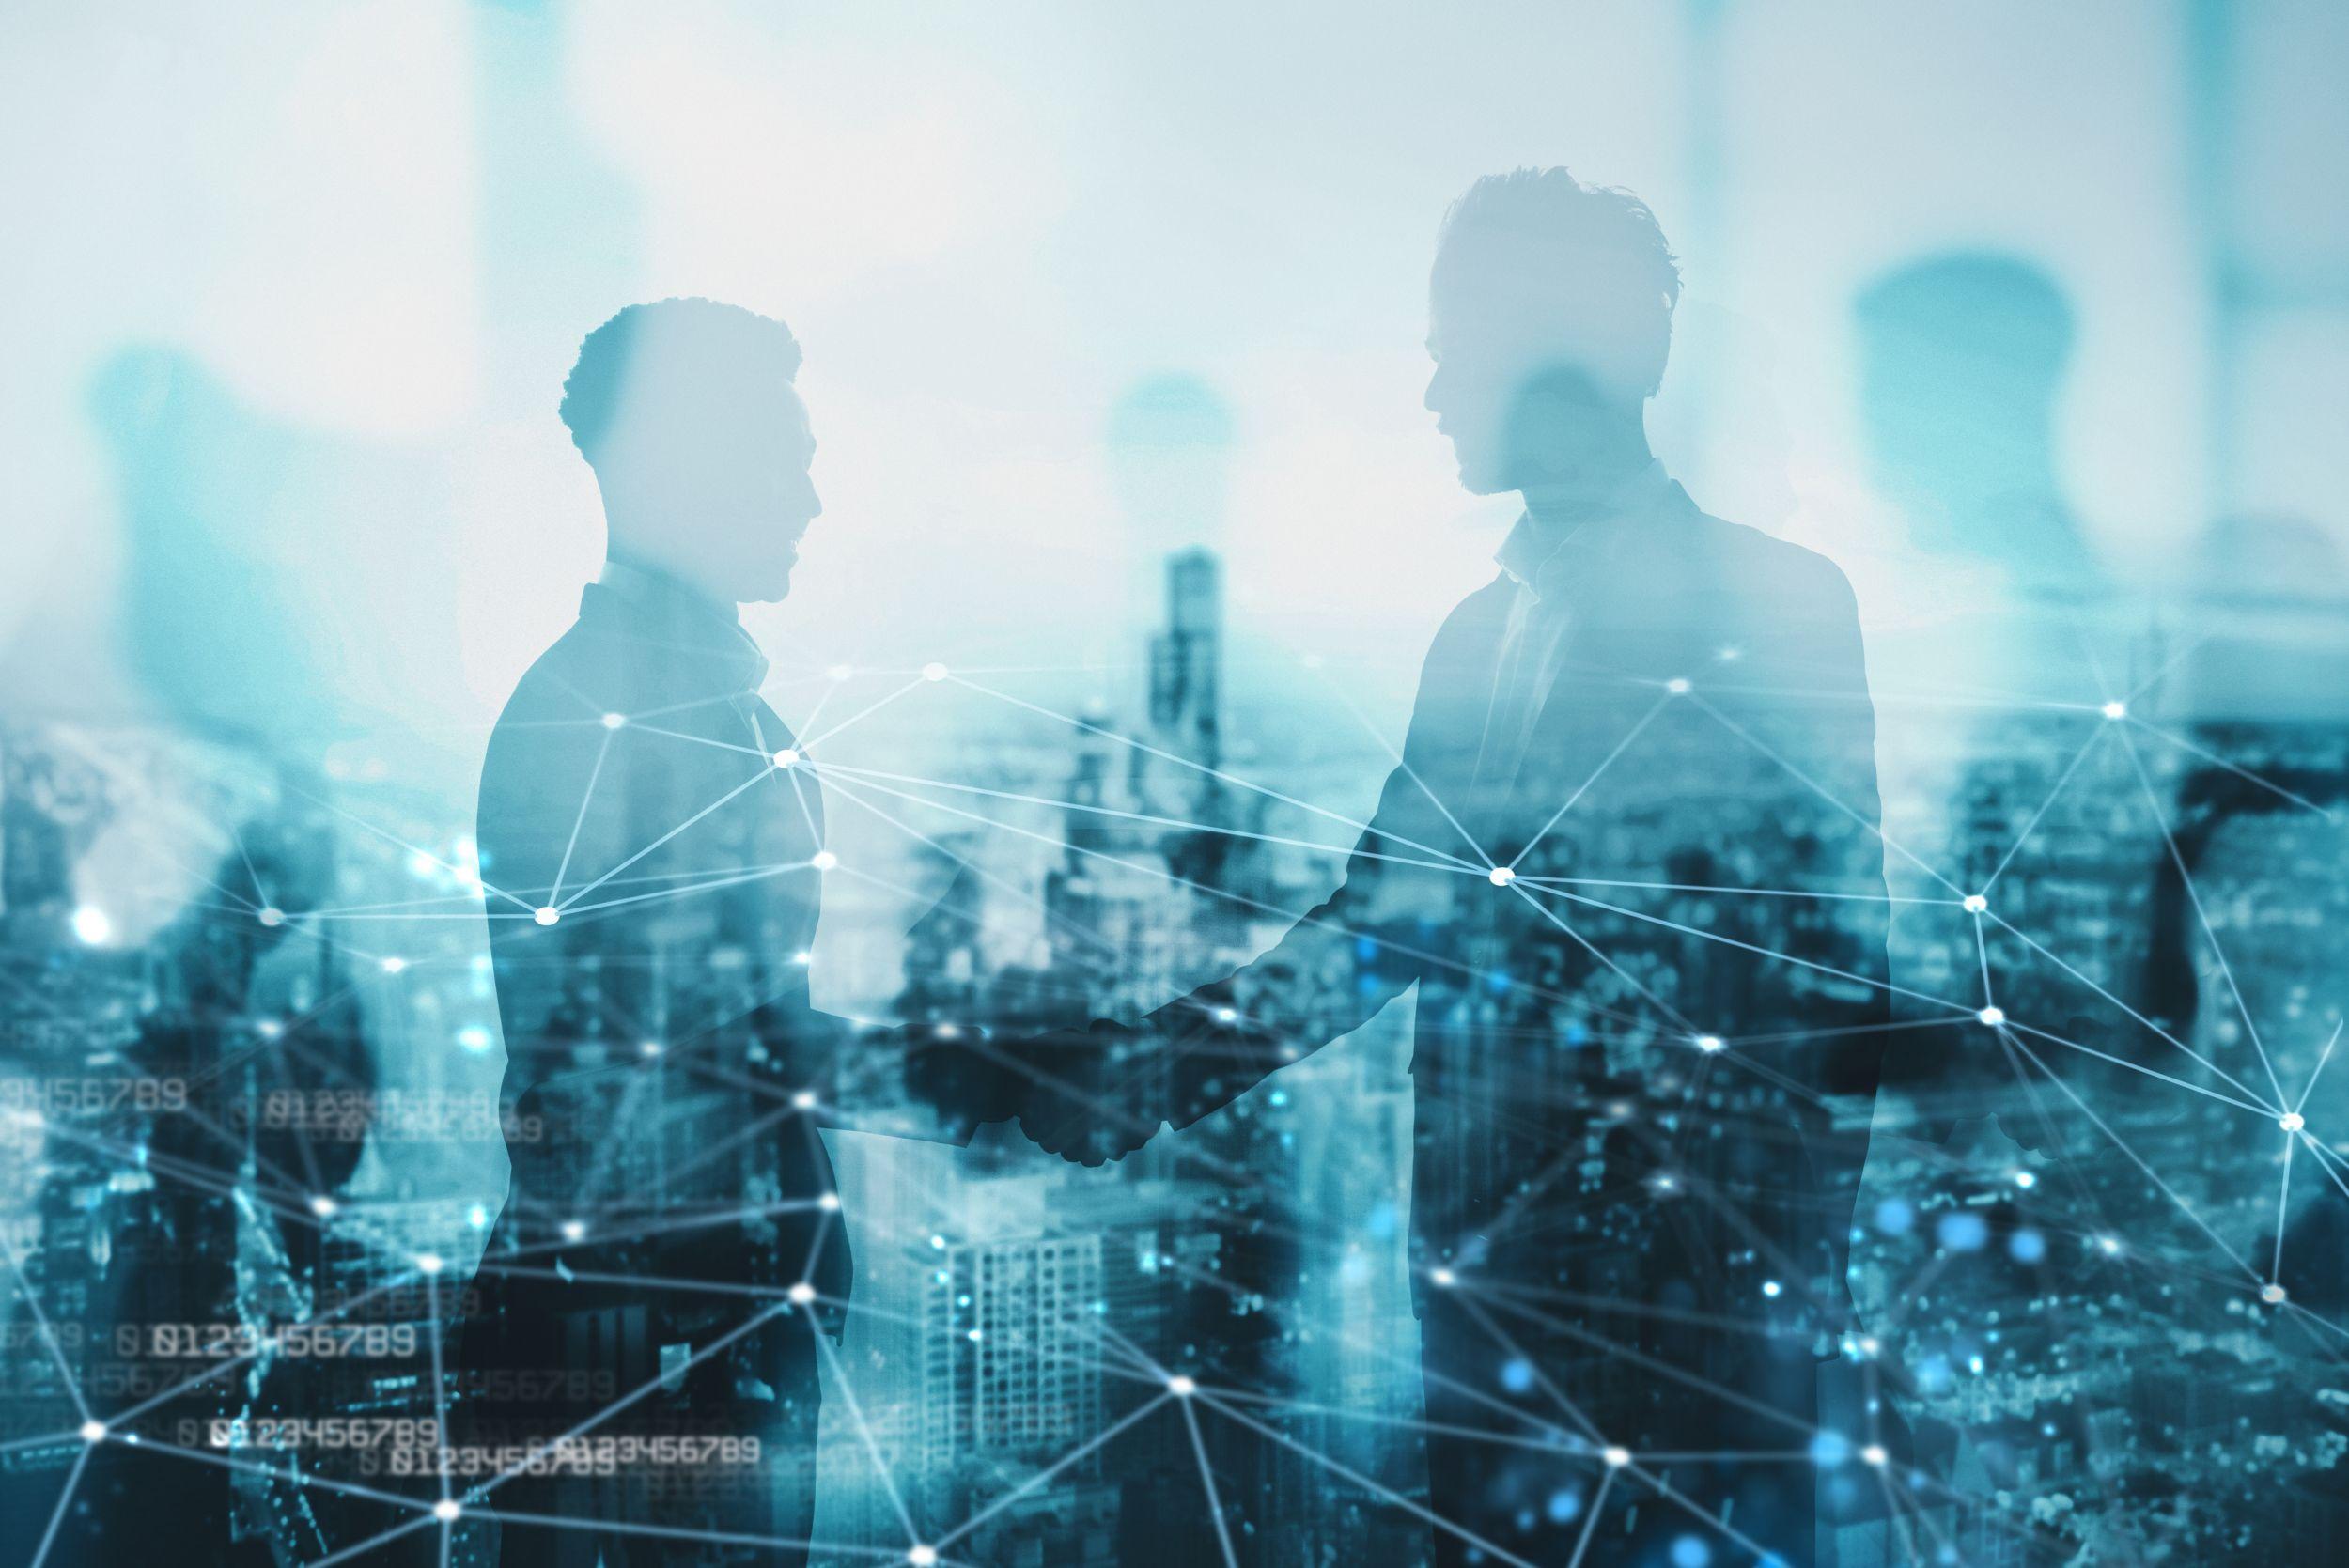 Mit digitalen Experimenten zum IoT-Erfolg